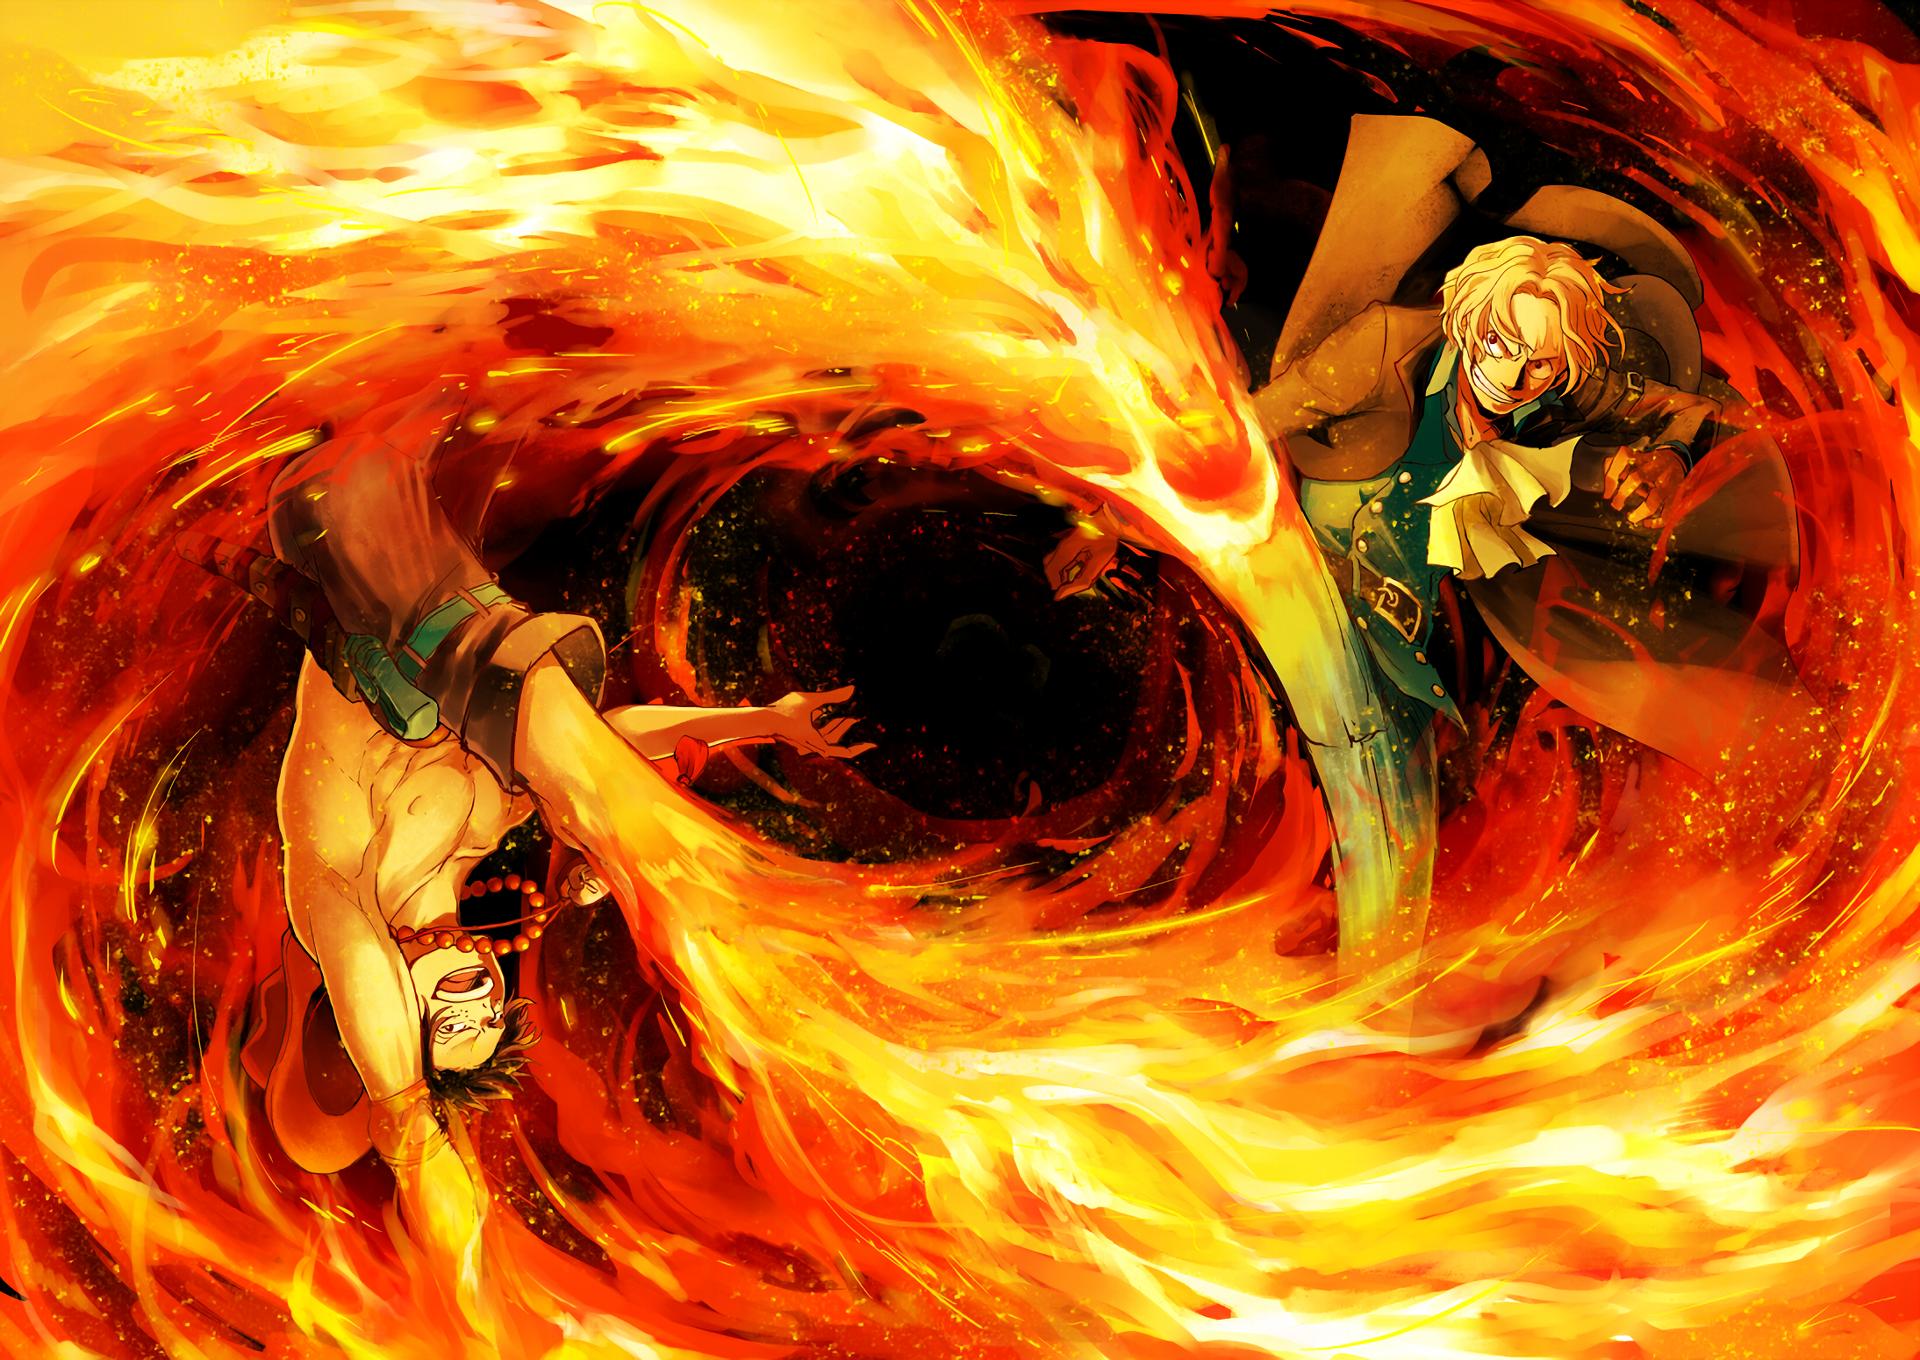 One Piece Fond d'écran HD | Arrière-Plan | 1920x1360 | ID:728224 - Wallpaper Abyss